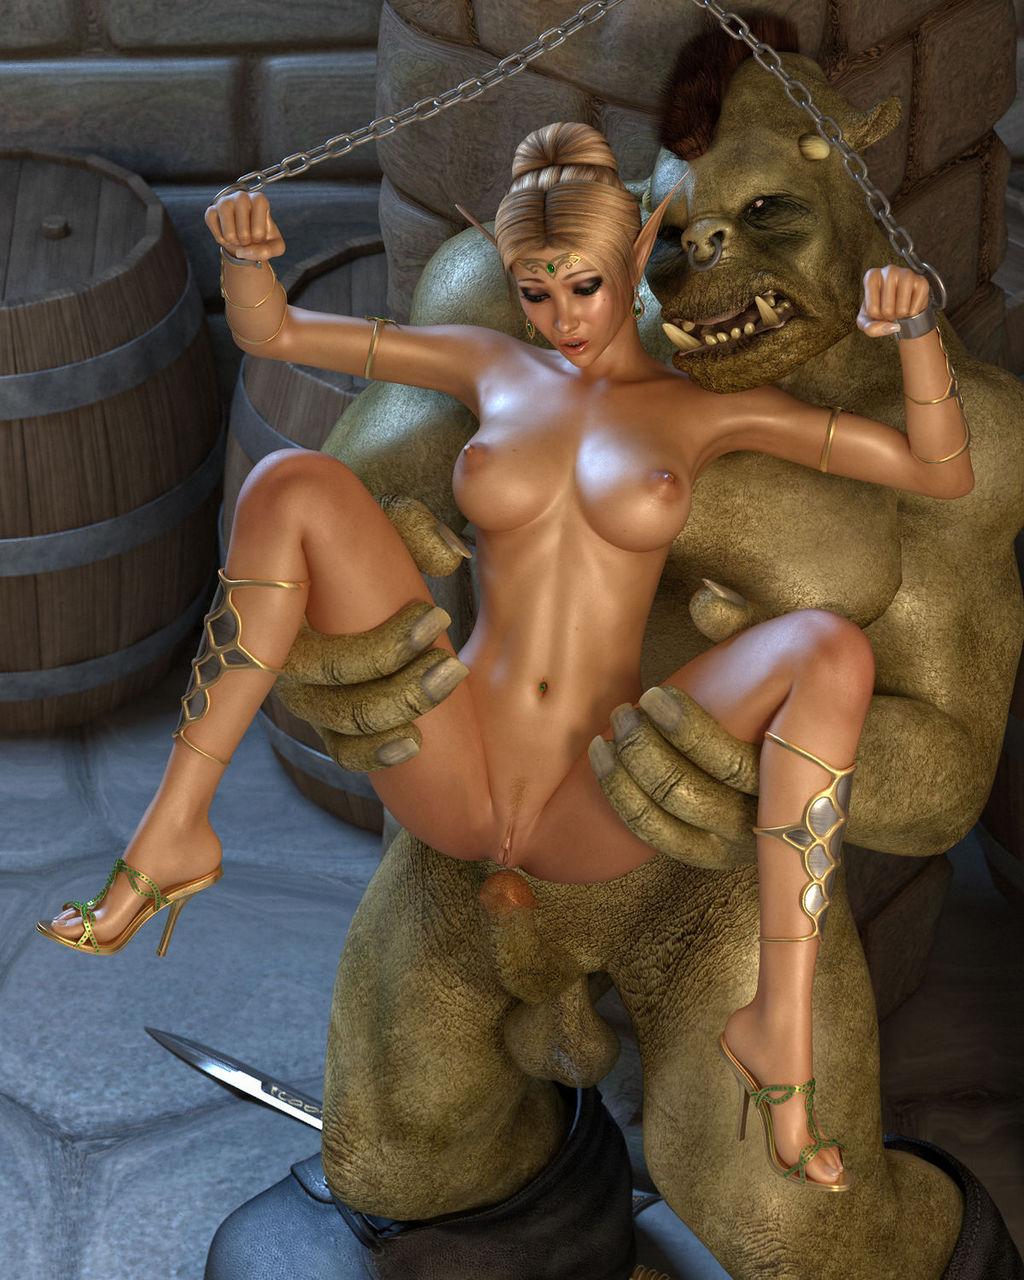 Sex toon mp4 porncraft pics